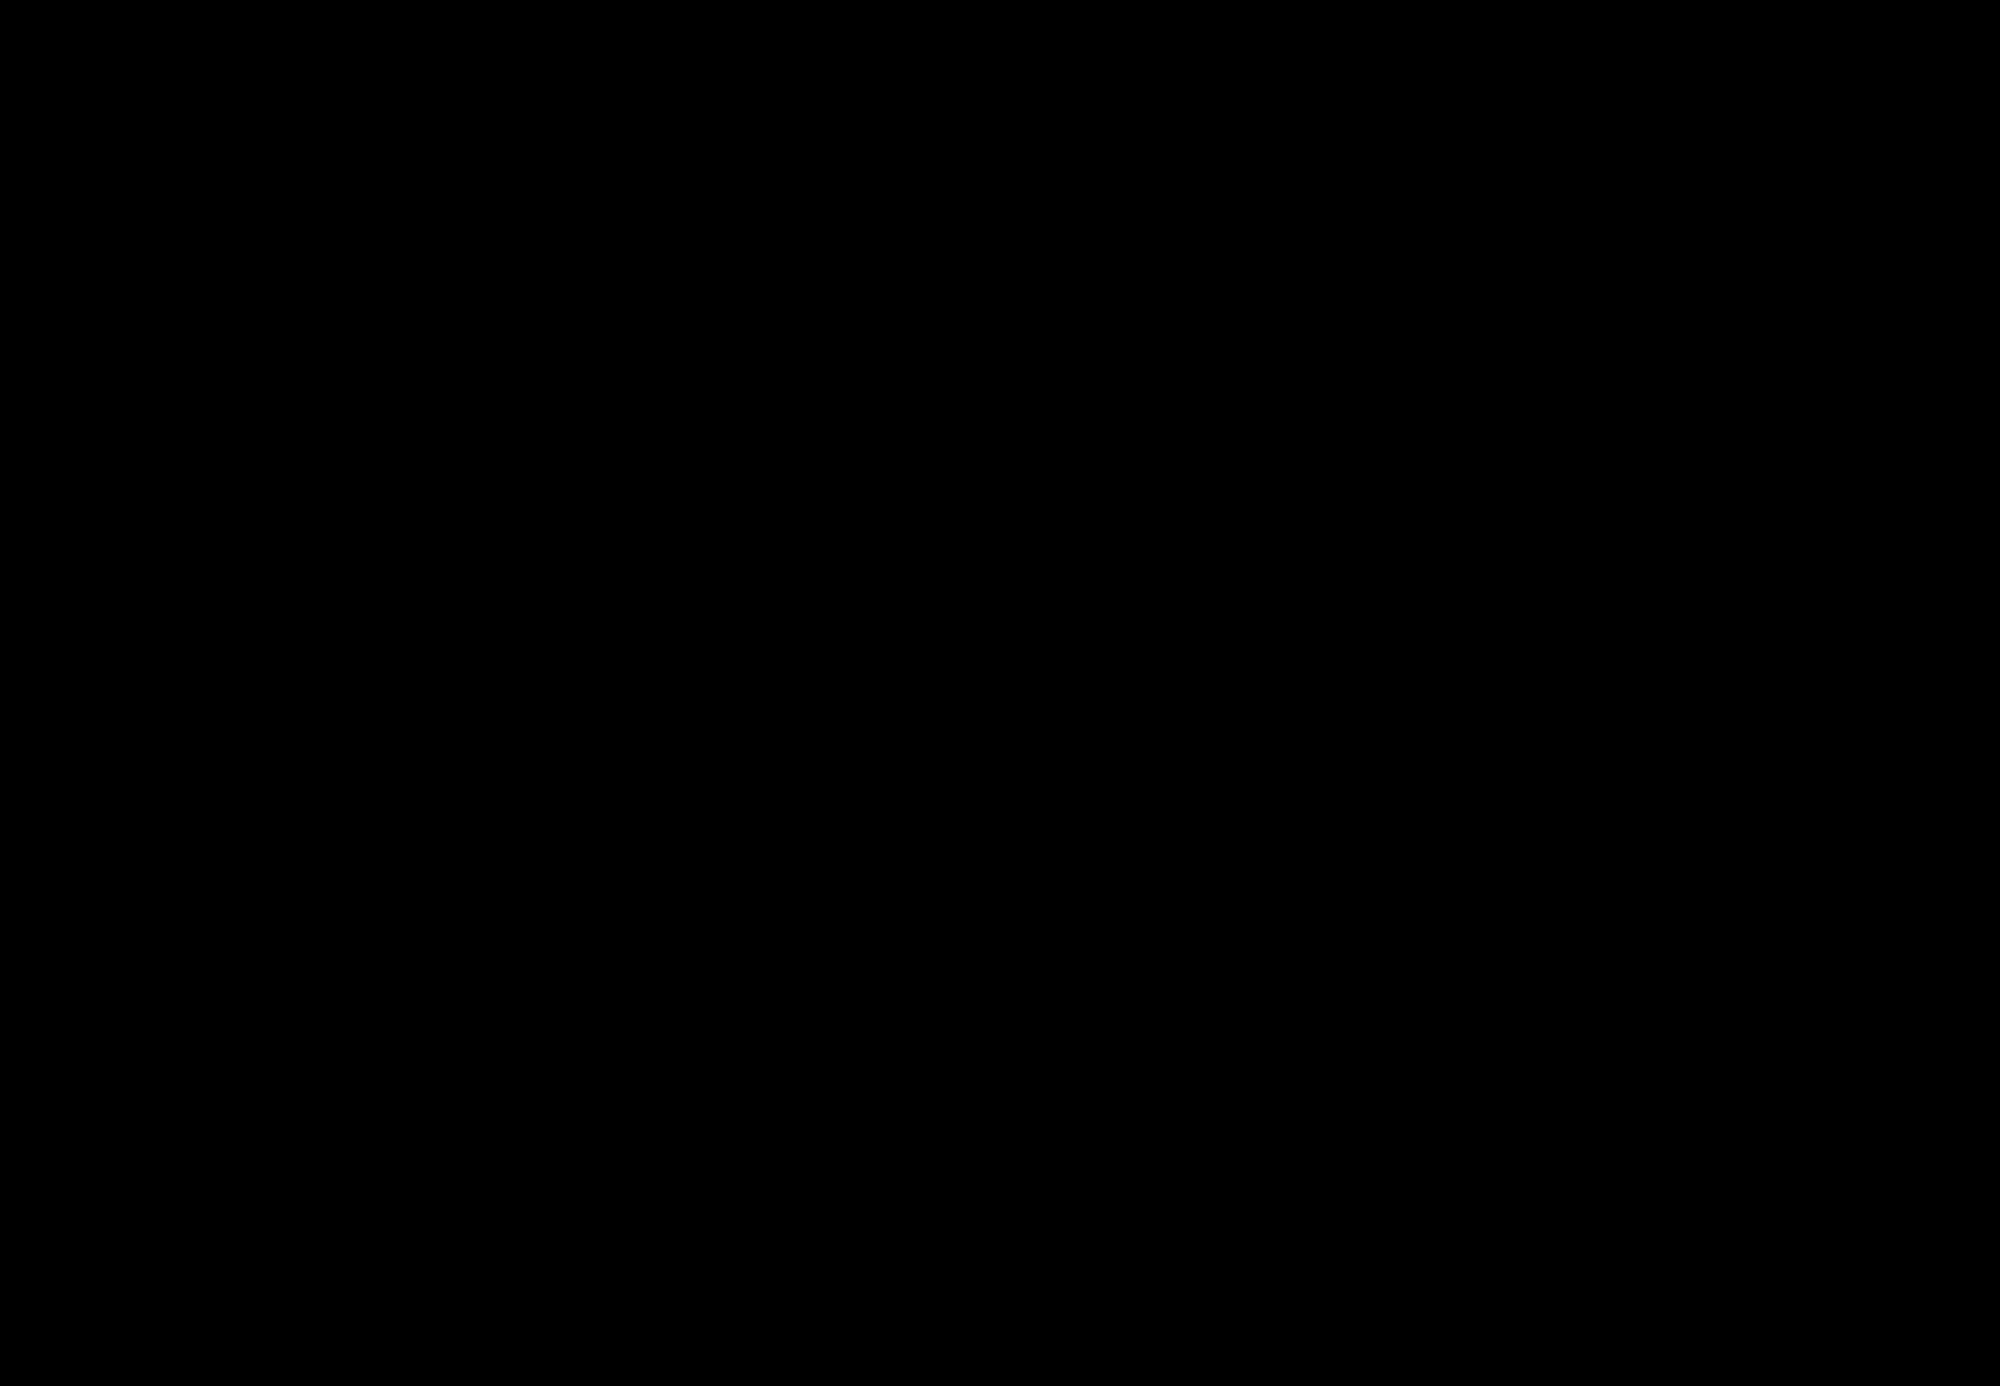 logo-blackconversation.png